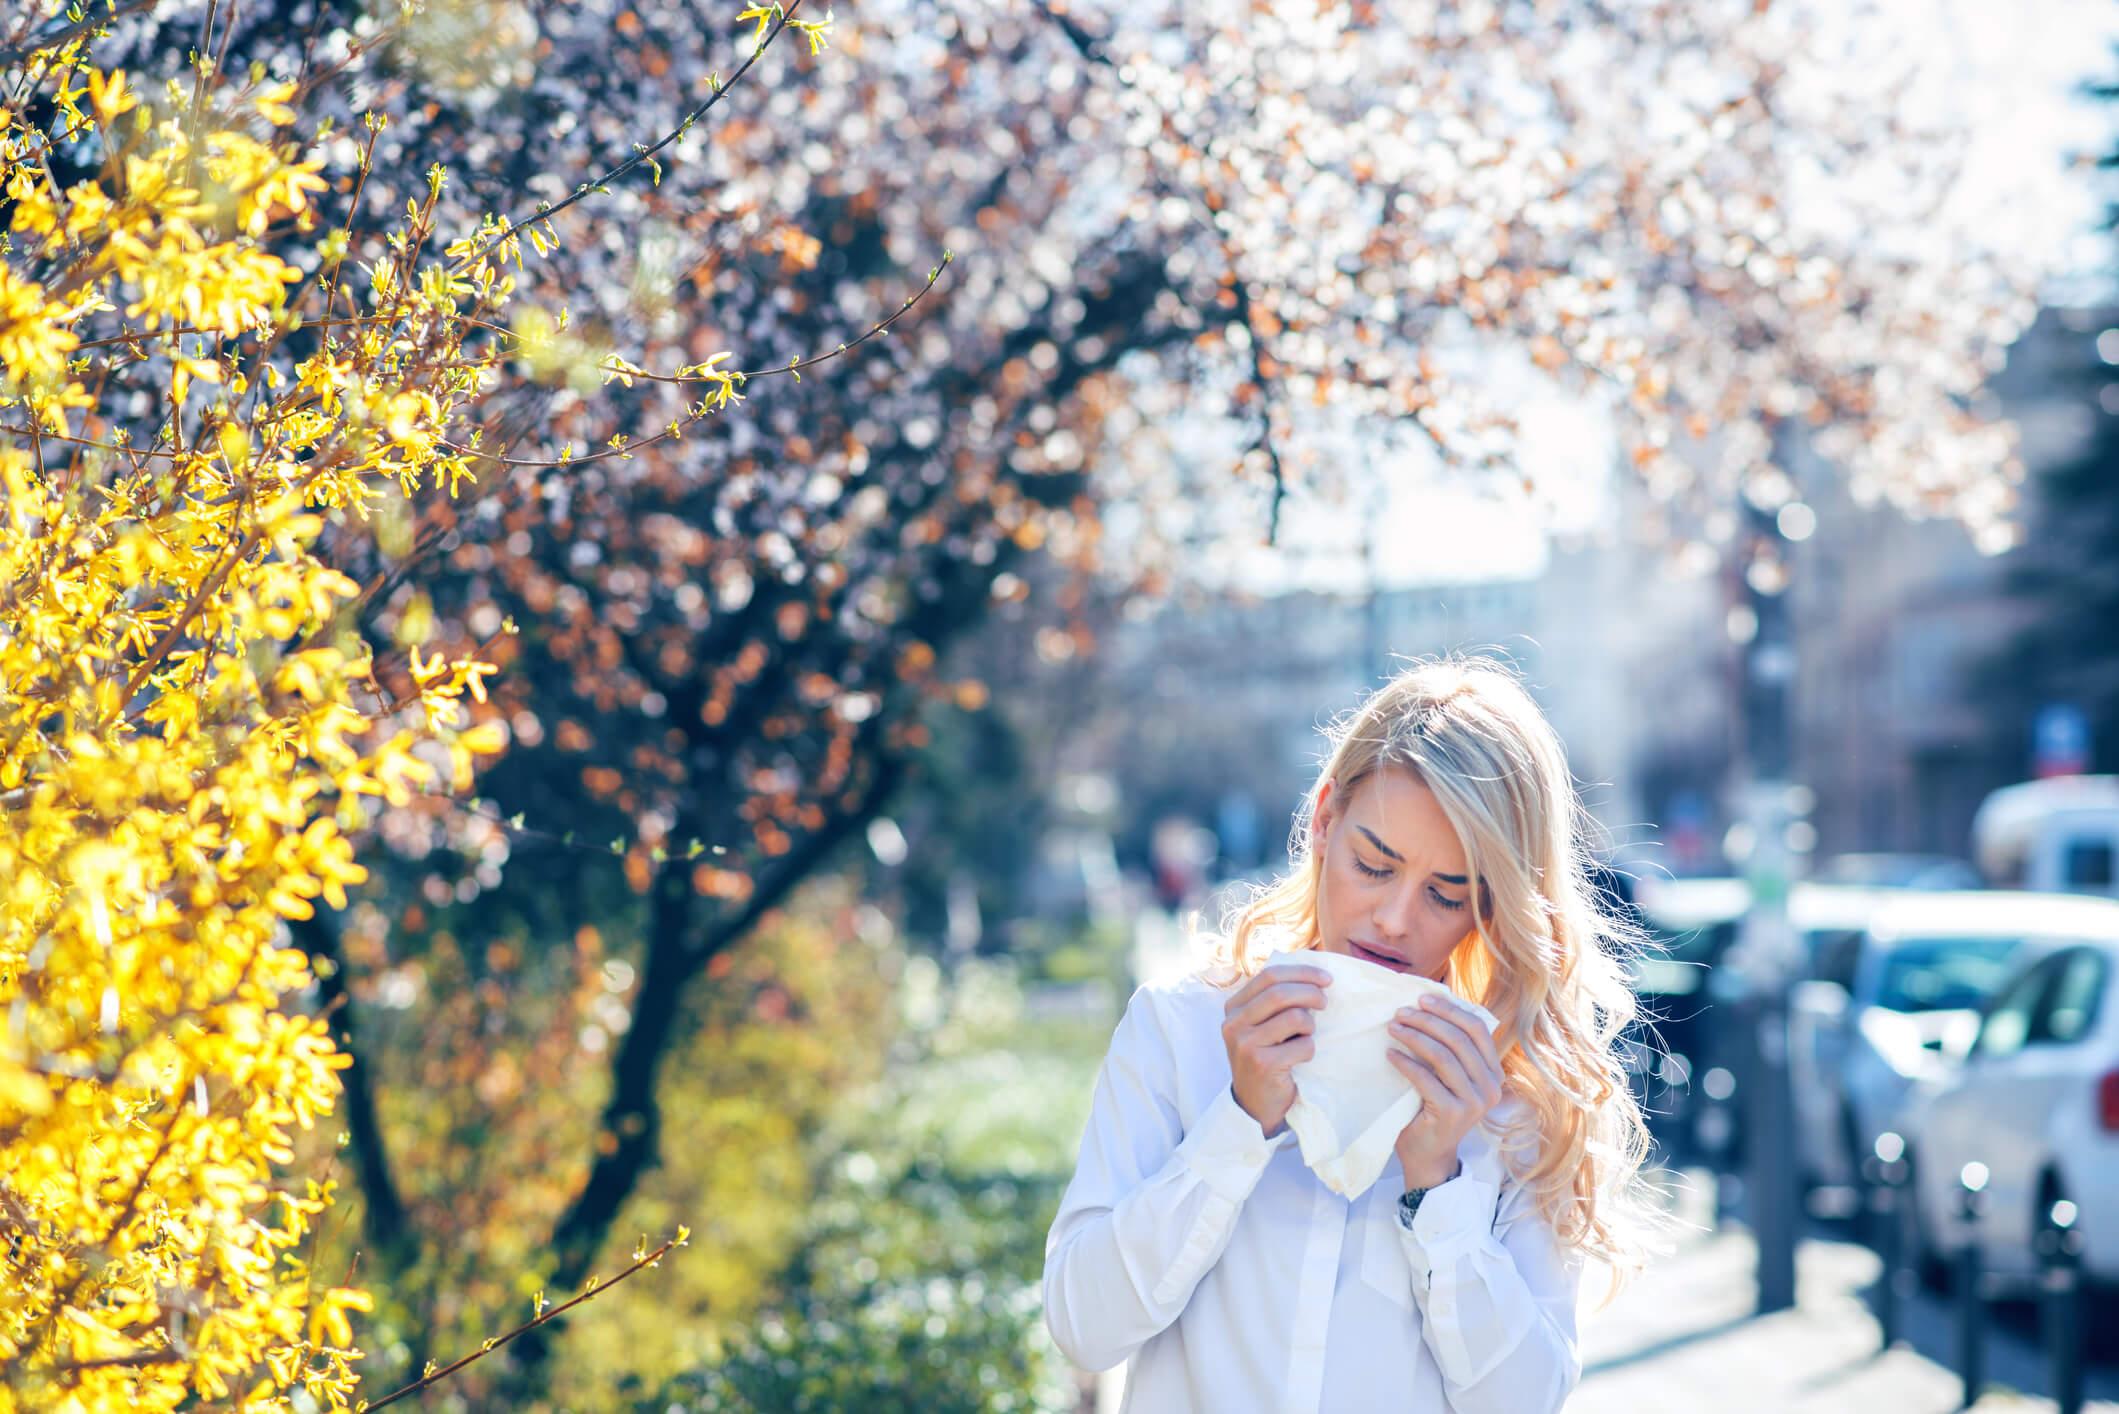 rhinite allergique symptôme